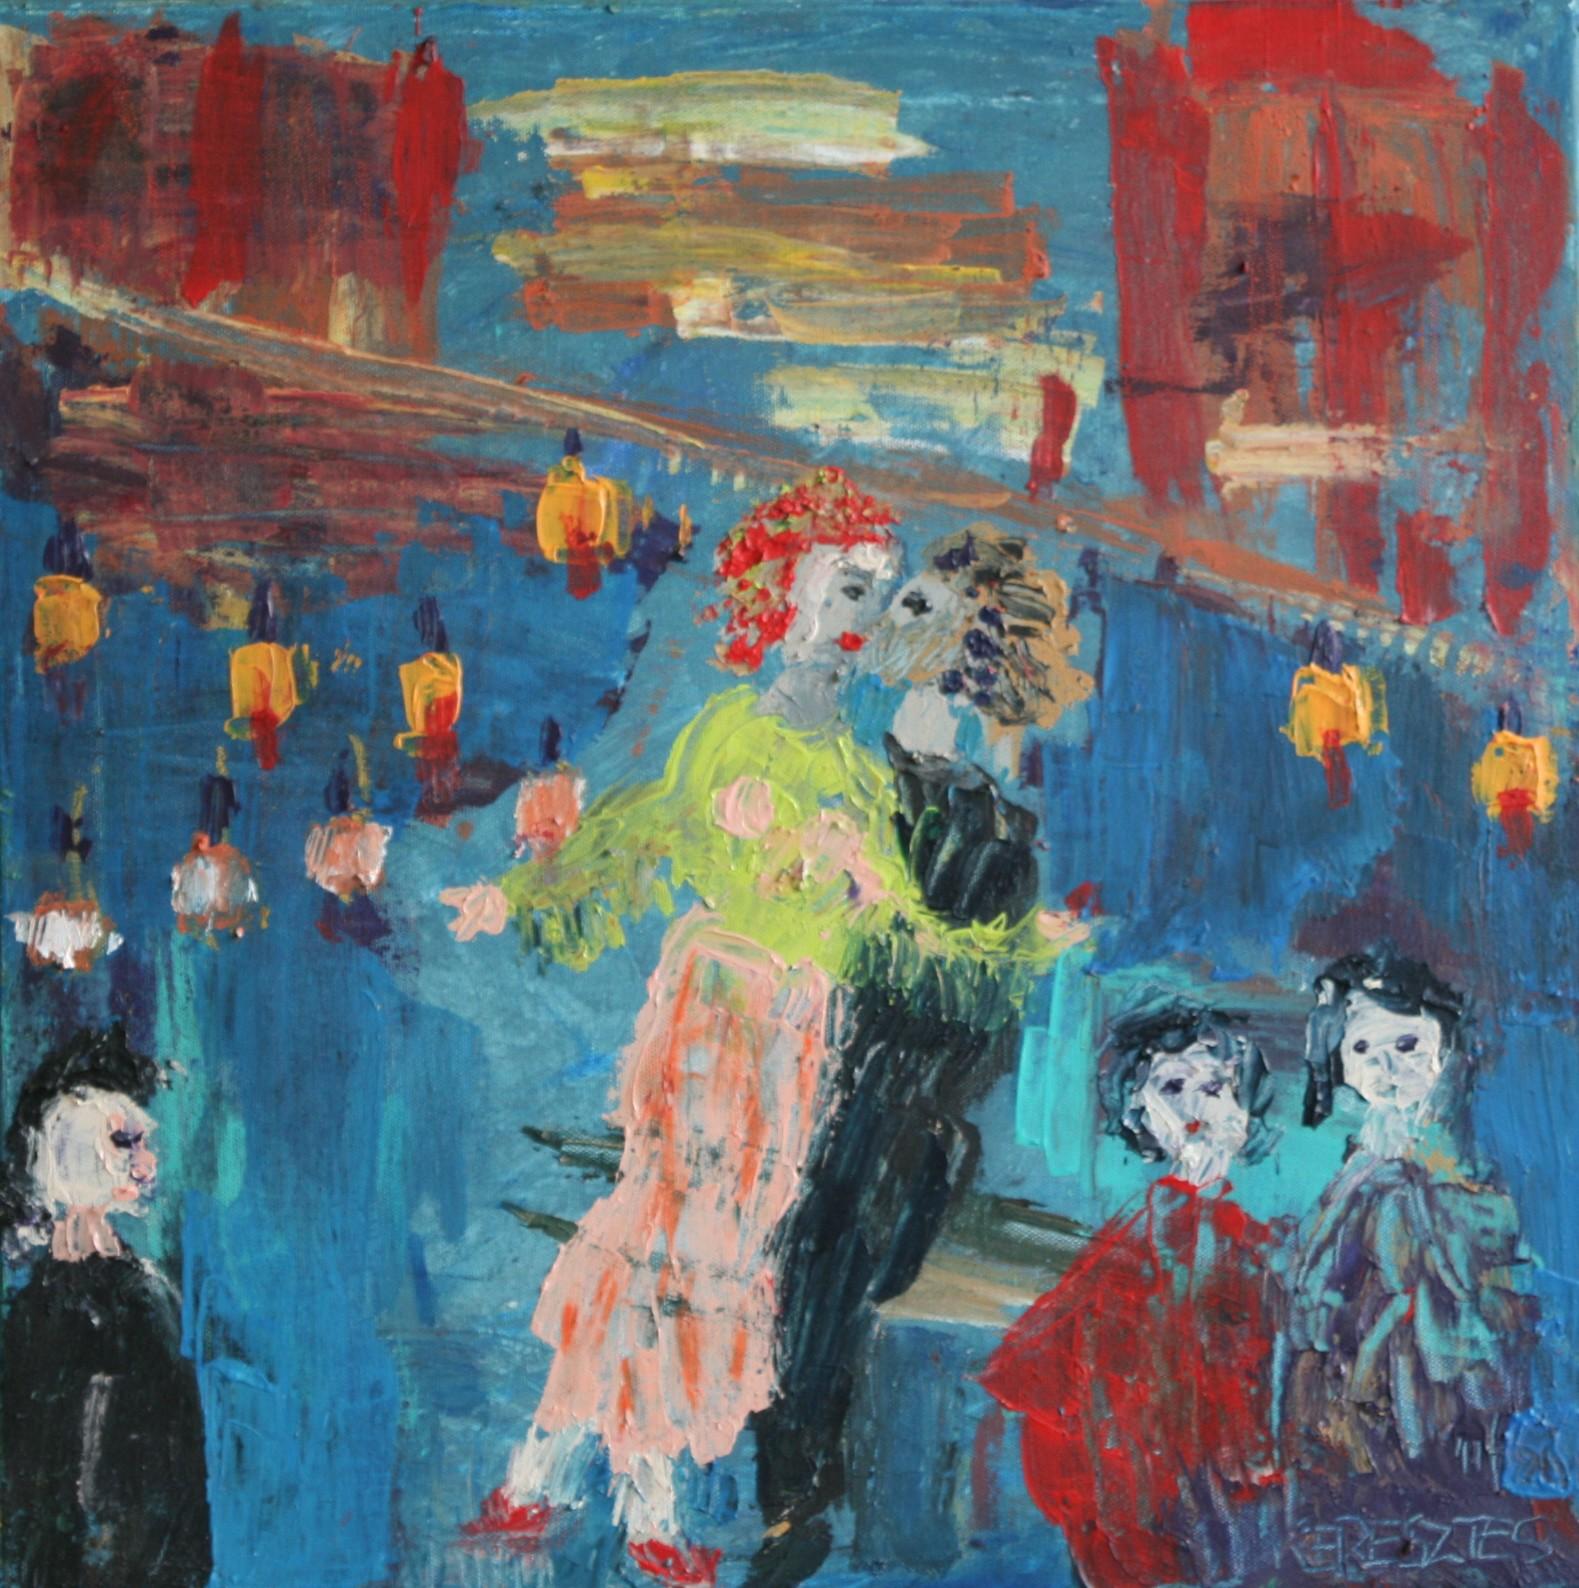 toile 27 - magdalena keresztes, artiste peintre à amiens